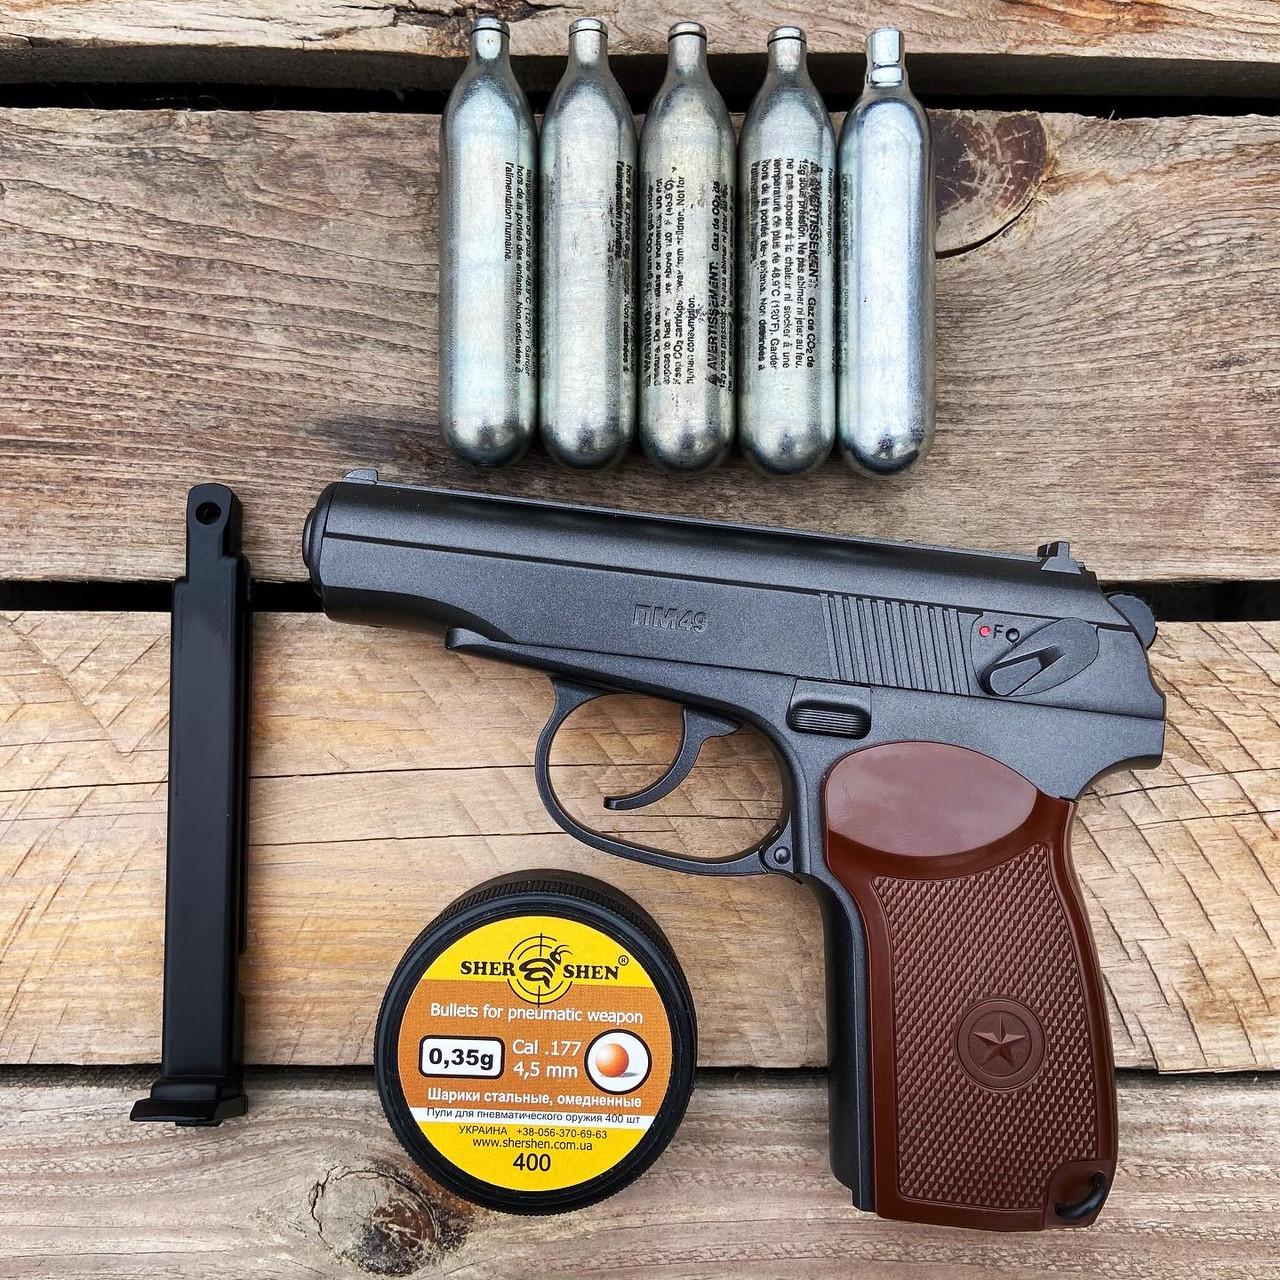 Пистолет пневматический Borner ПМ49 Makarov + 5 CO2 + 400 BB 4.5 мм